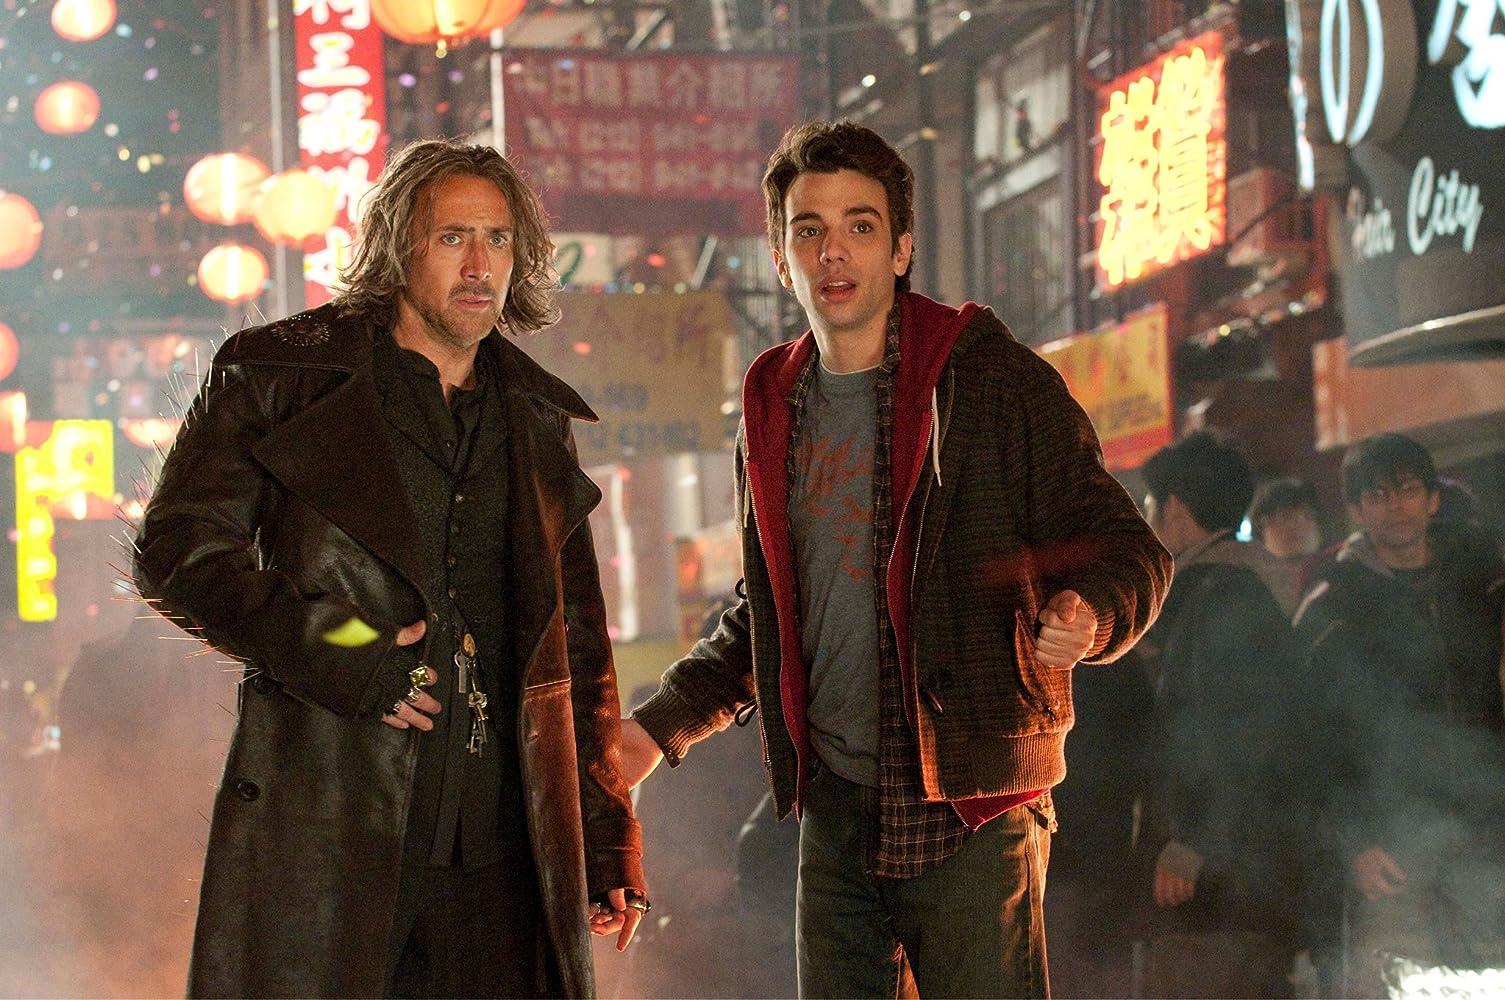 Nicolas Cage and Jay Baruchel in The Sorcerer's Apprentice (2010)